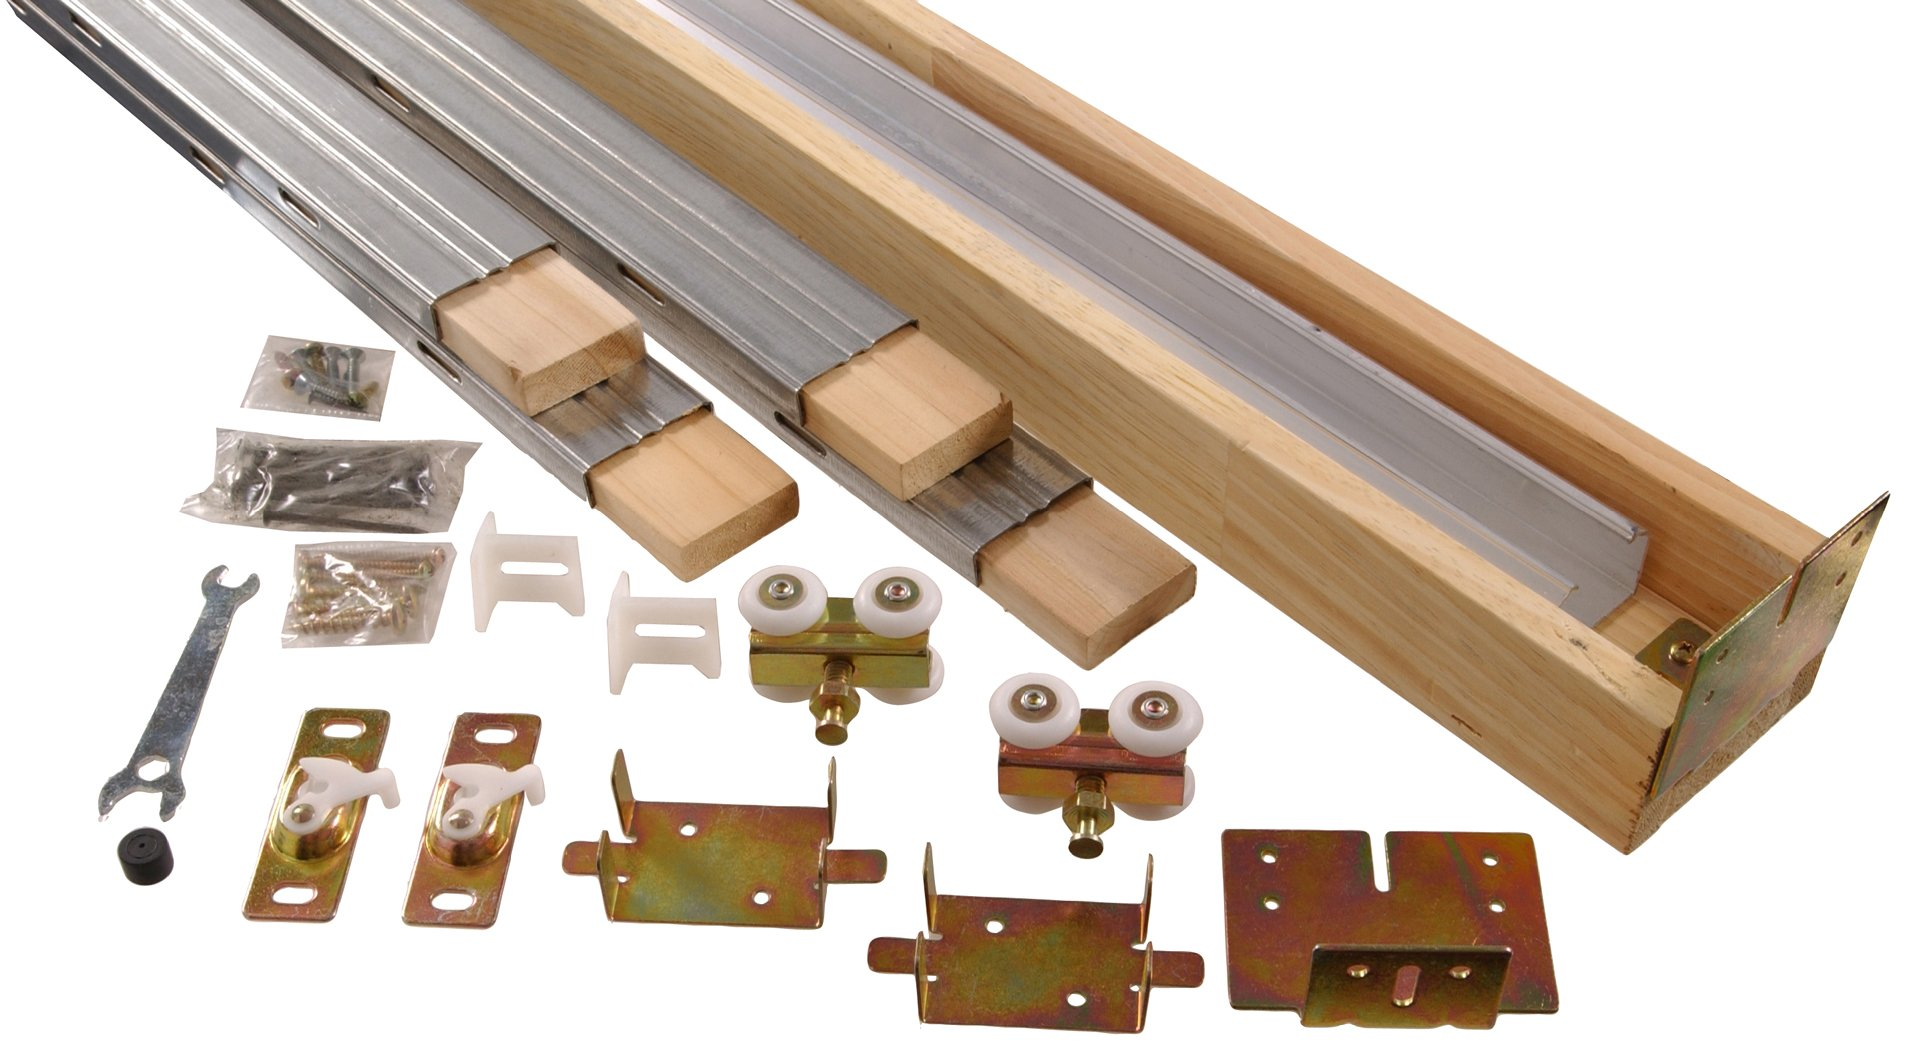 Hillman Hardware Essentials Pocket Door Hardware Set 24''-36'' Opening, 1-Kit